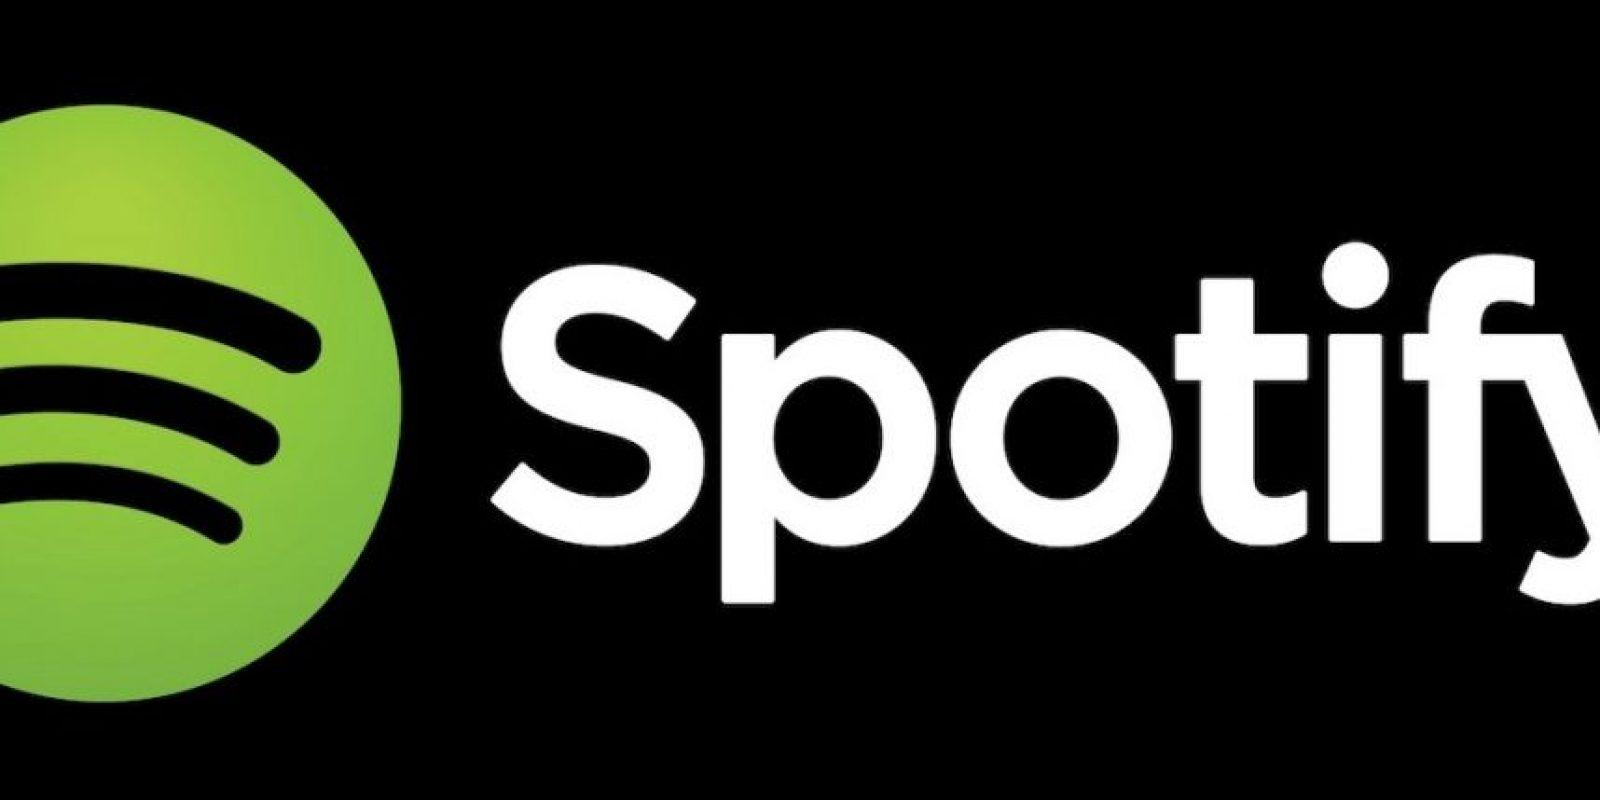 El catálogo de Spotify llega a las 30 millones de canciones. Foto:Spotify